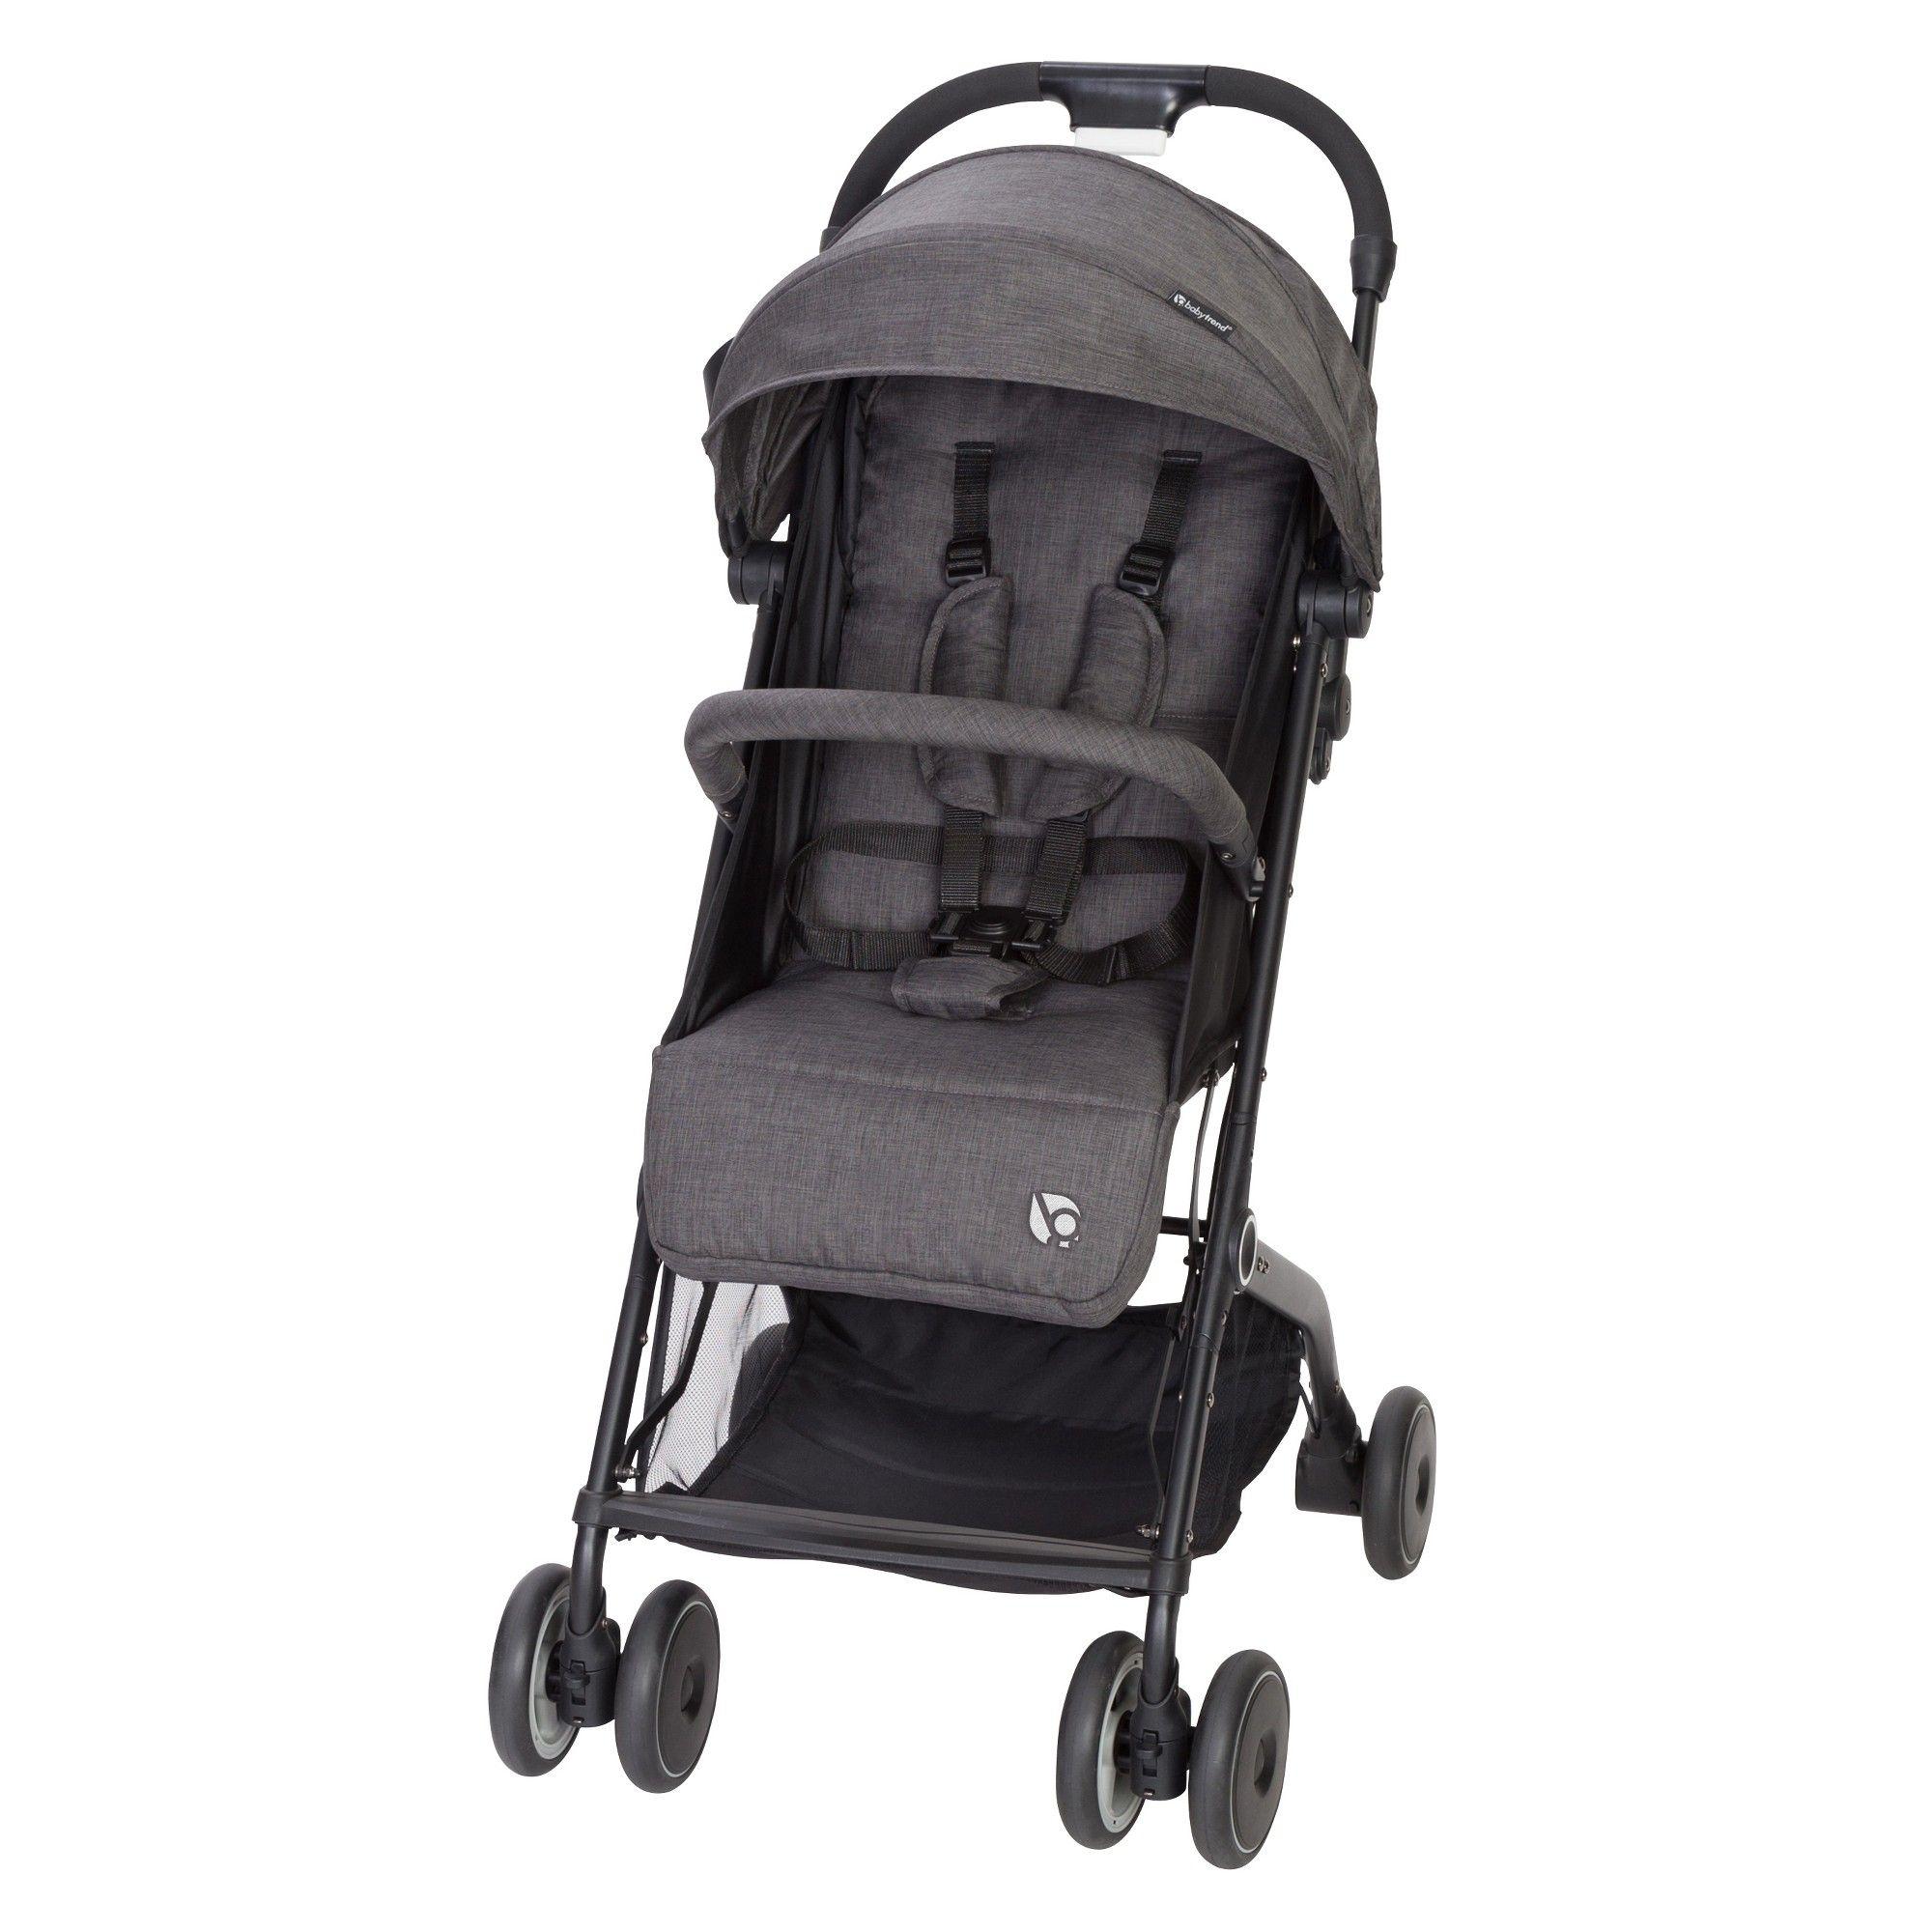 Baby Trend Jetaway Compact Stroller Ash, Gray Umbrella